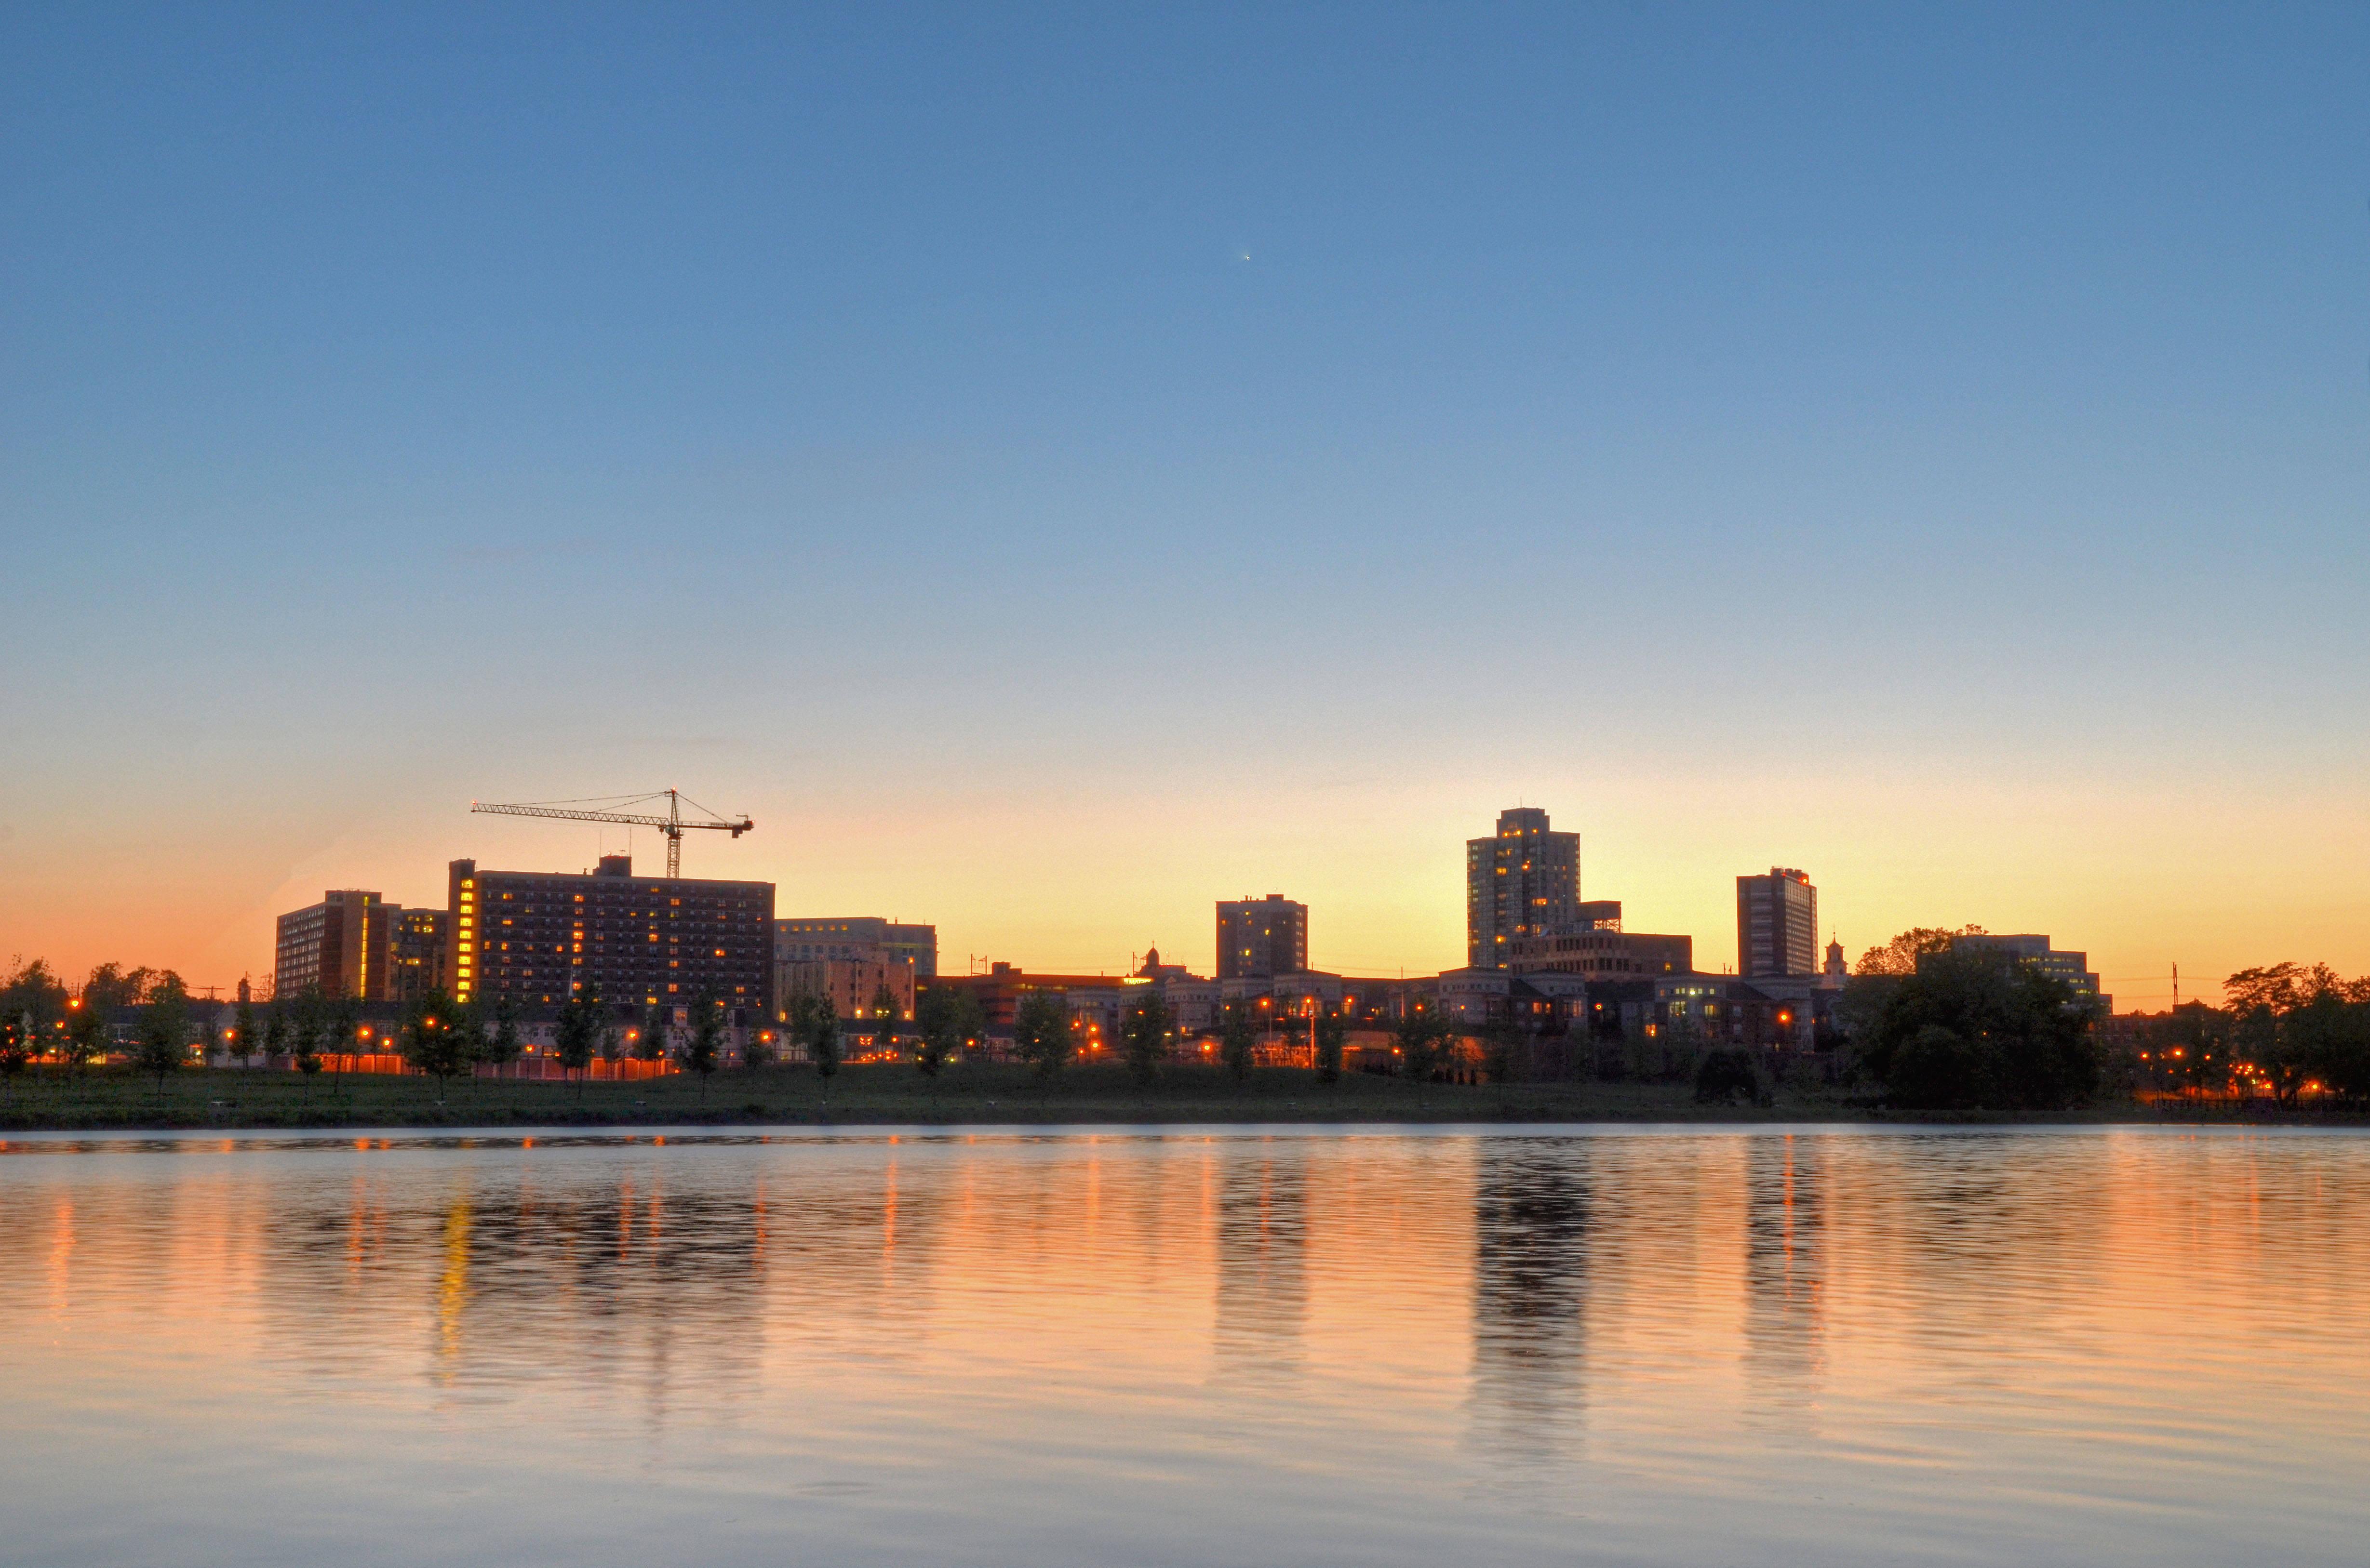 a1d91bb0ea2a611ce9ed_New_Brunswick_NJ_Skyline_at_Sunset.jpg